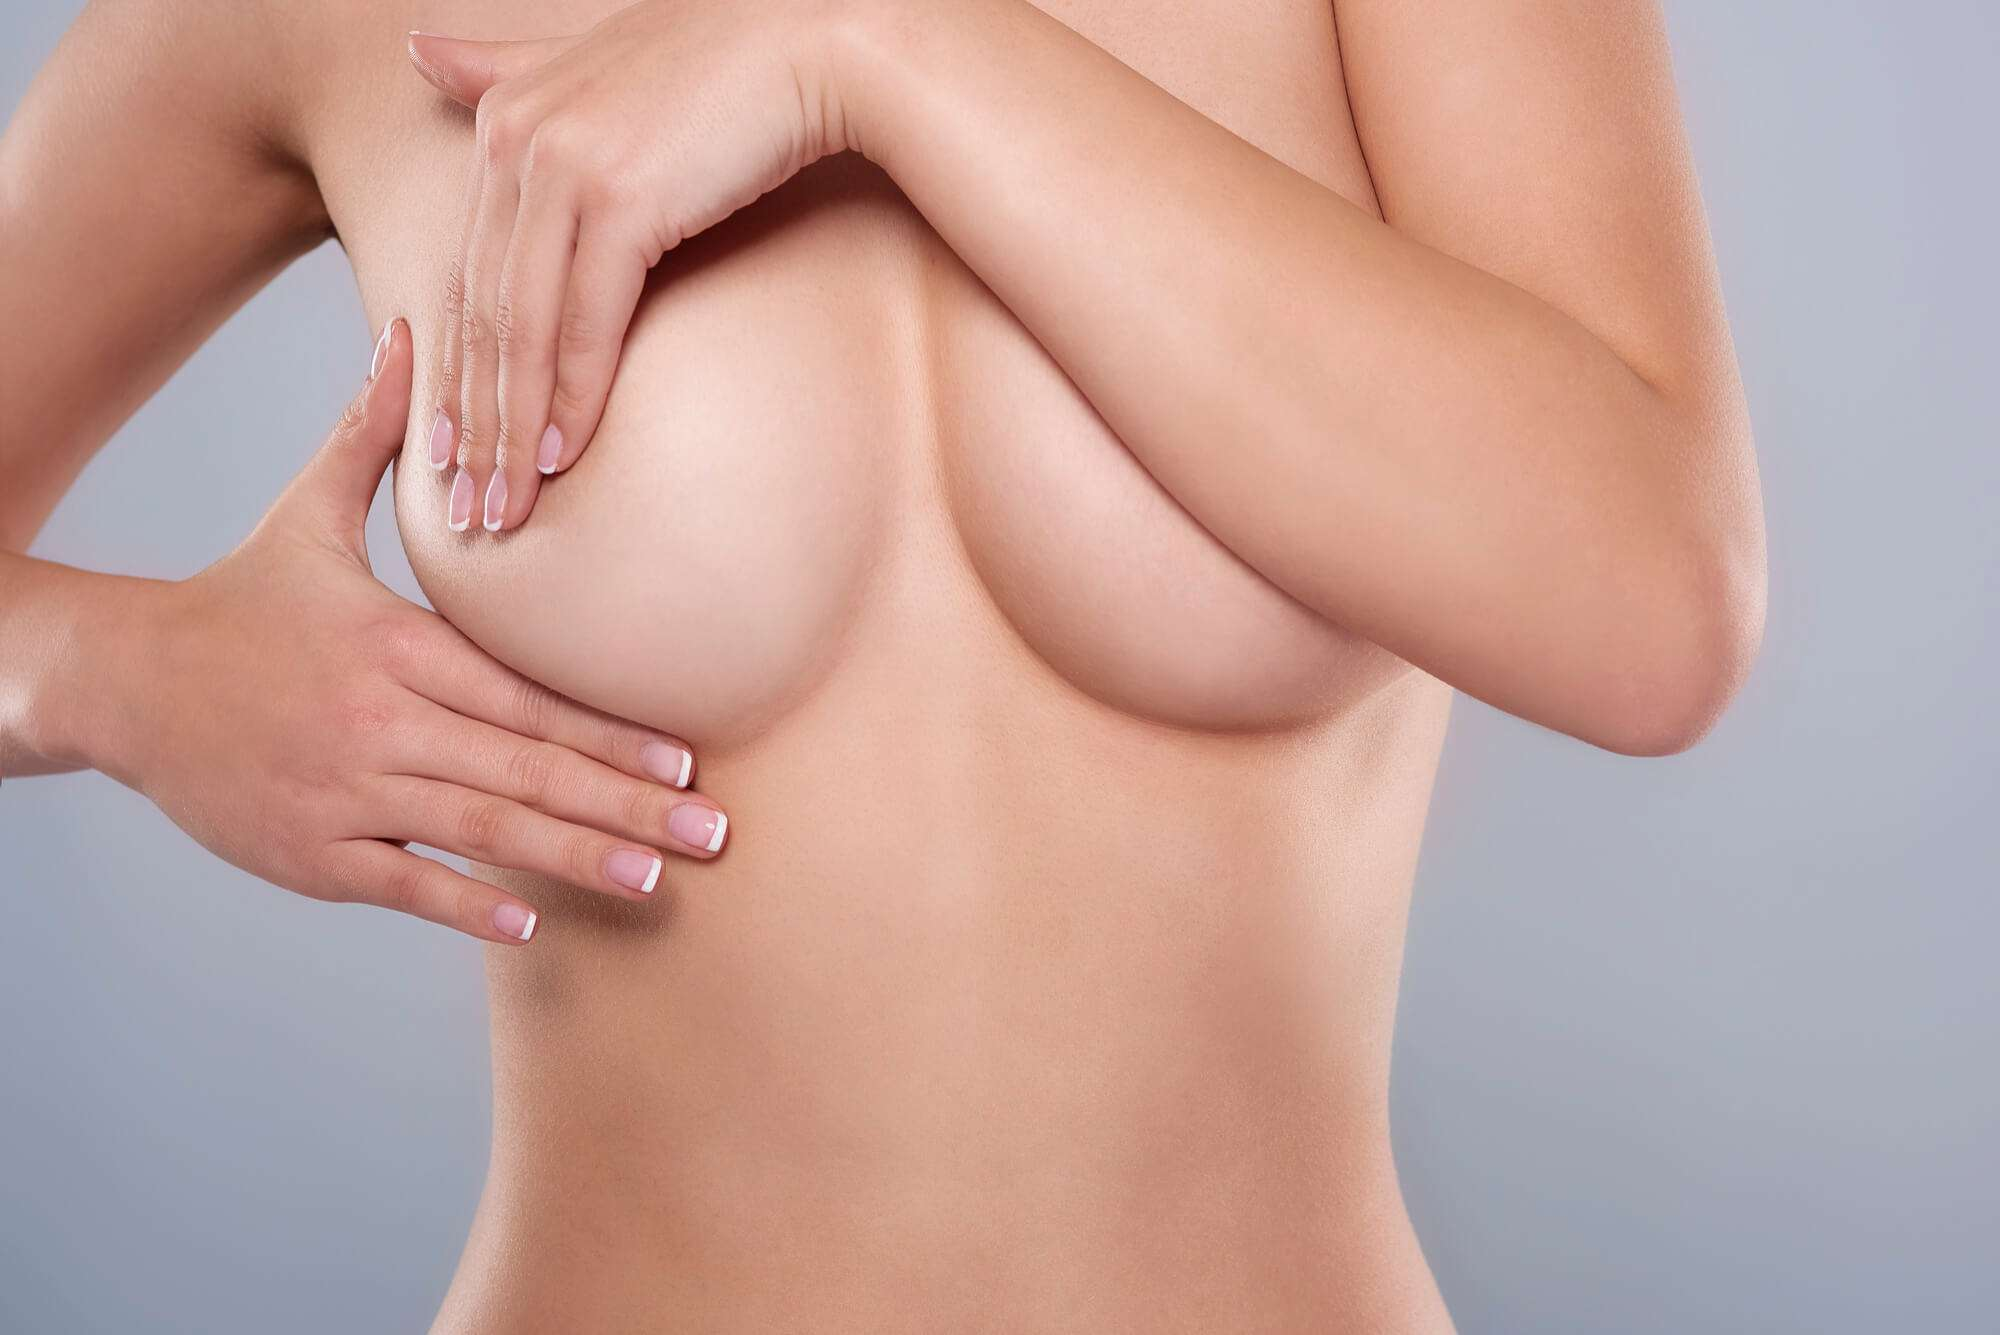 The Boob Implants Trends